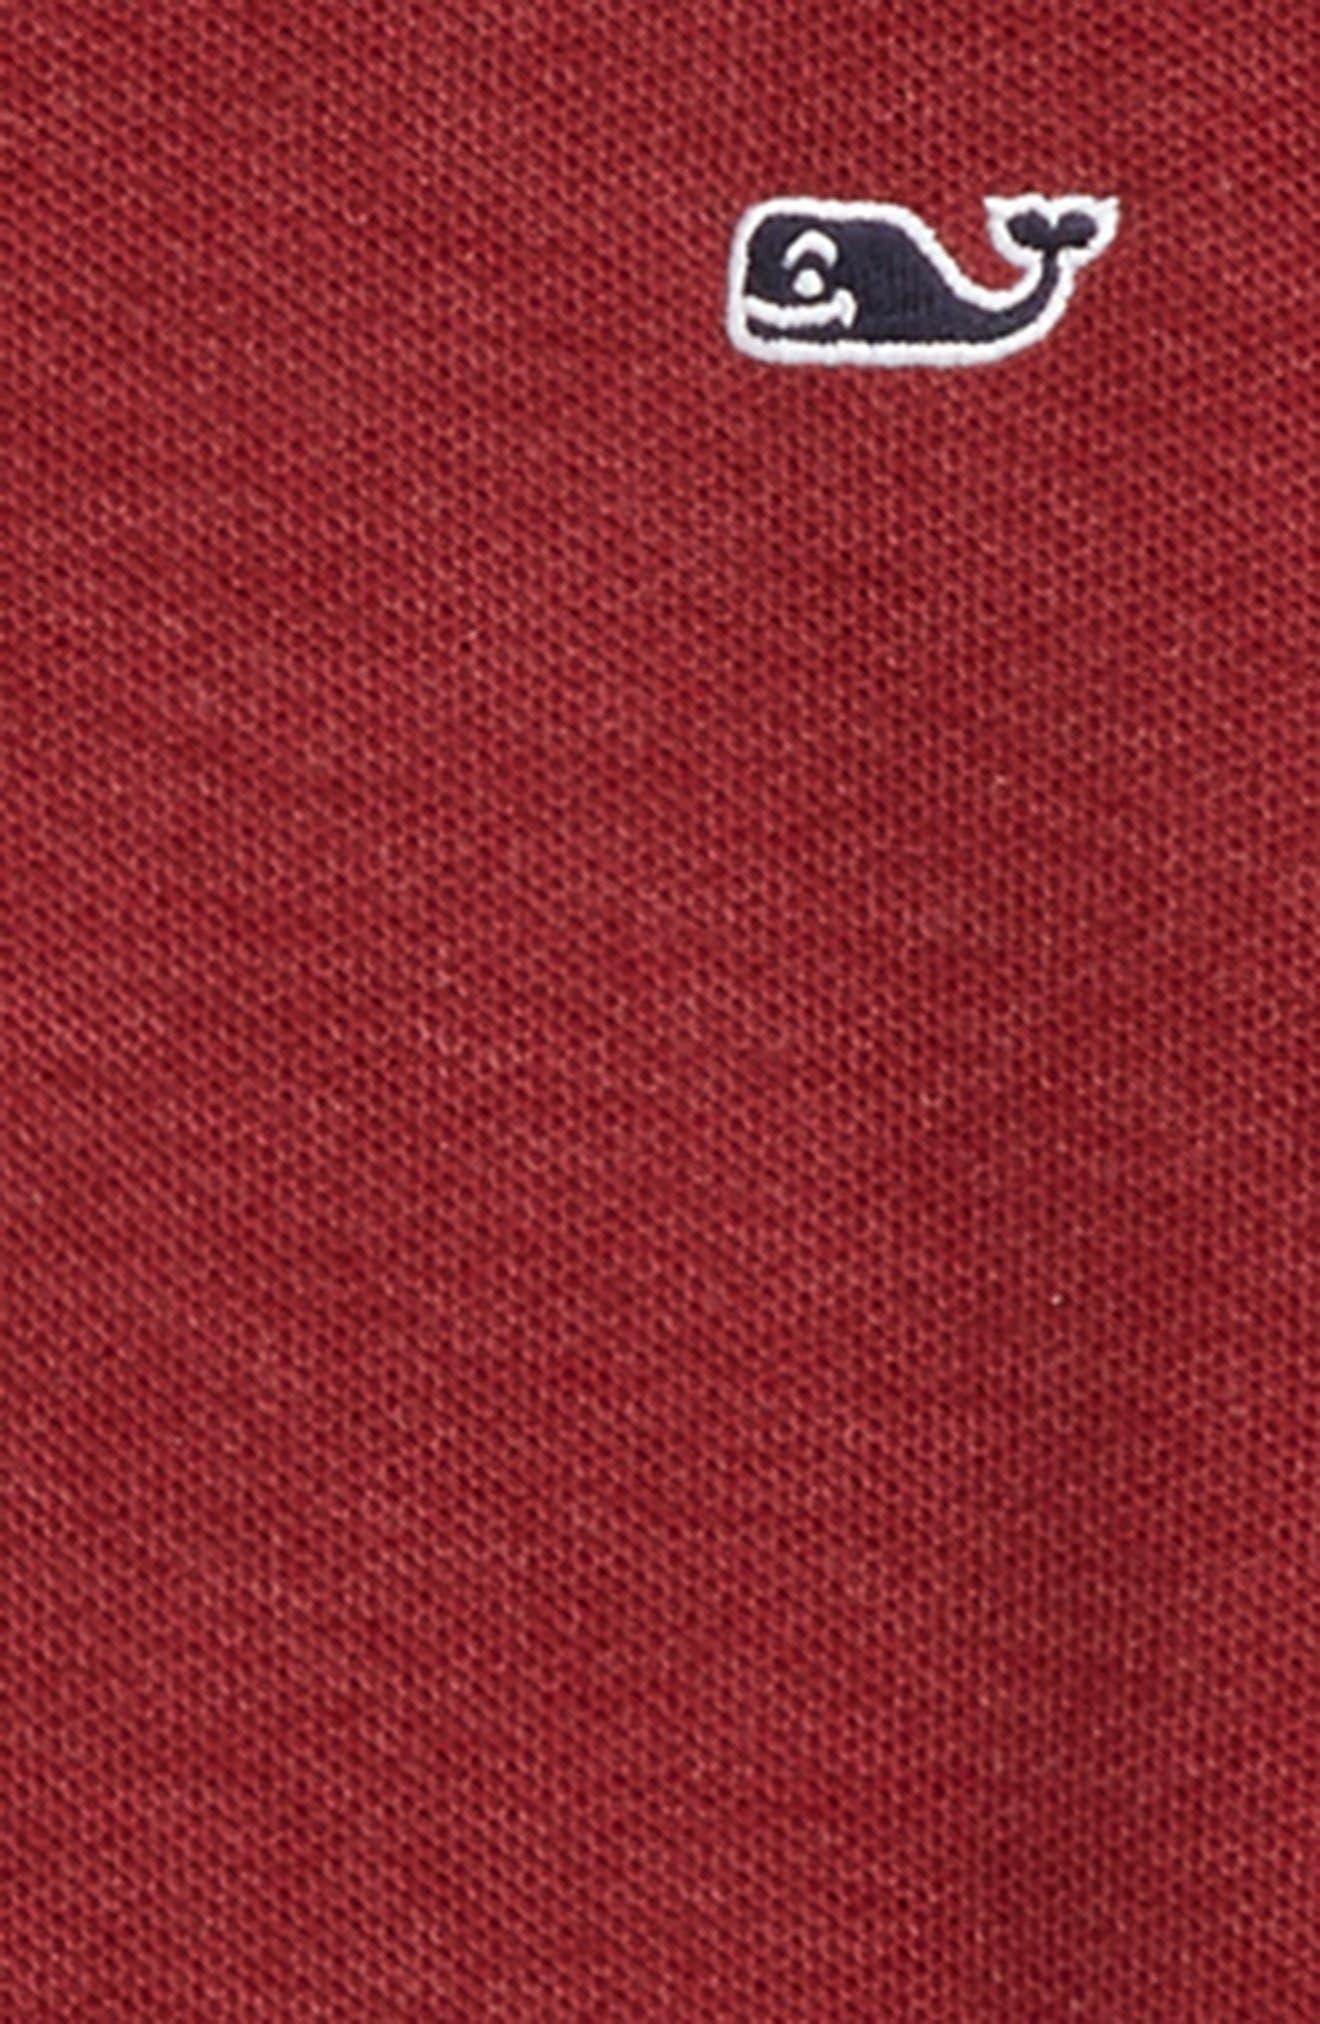 Quarter Zip Sweater,                             Alternate thumbnail 2, color,                             603